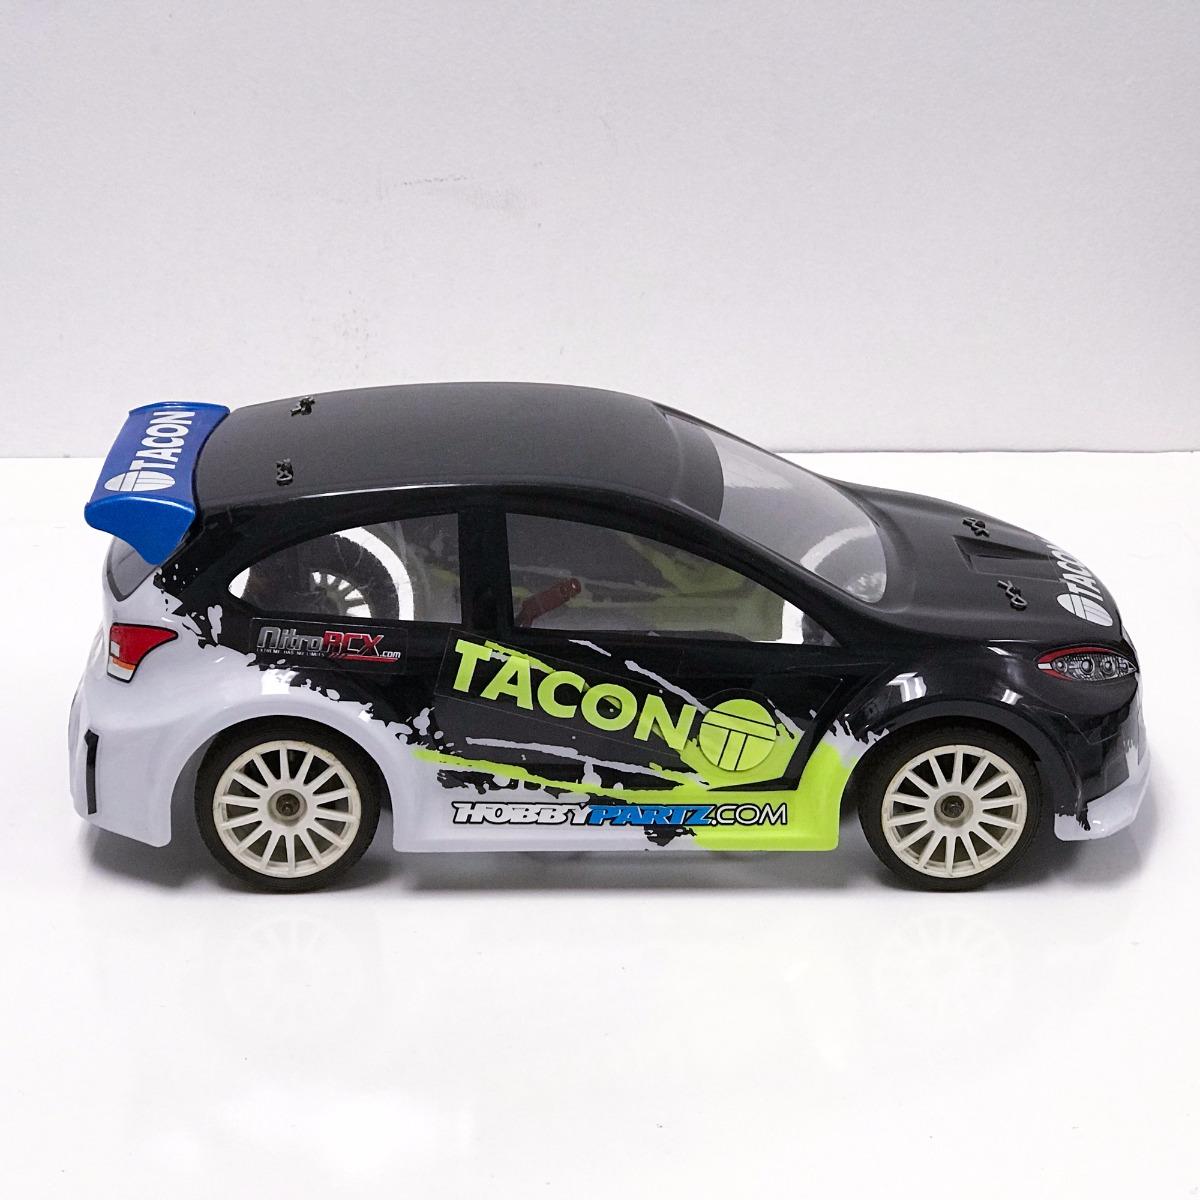 1/12th Tacon Ranger Rally Hatchback Car Brushless Motor RC Rally ...